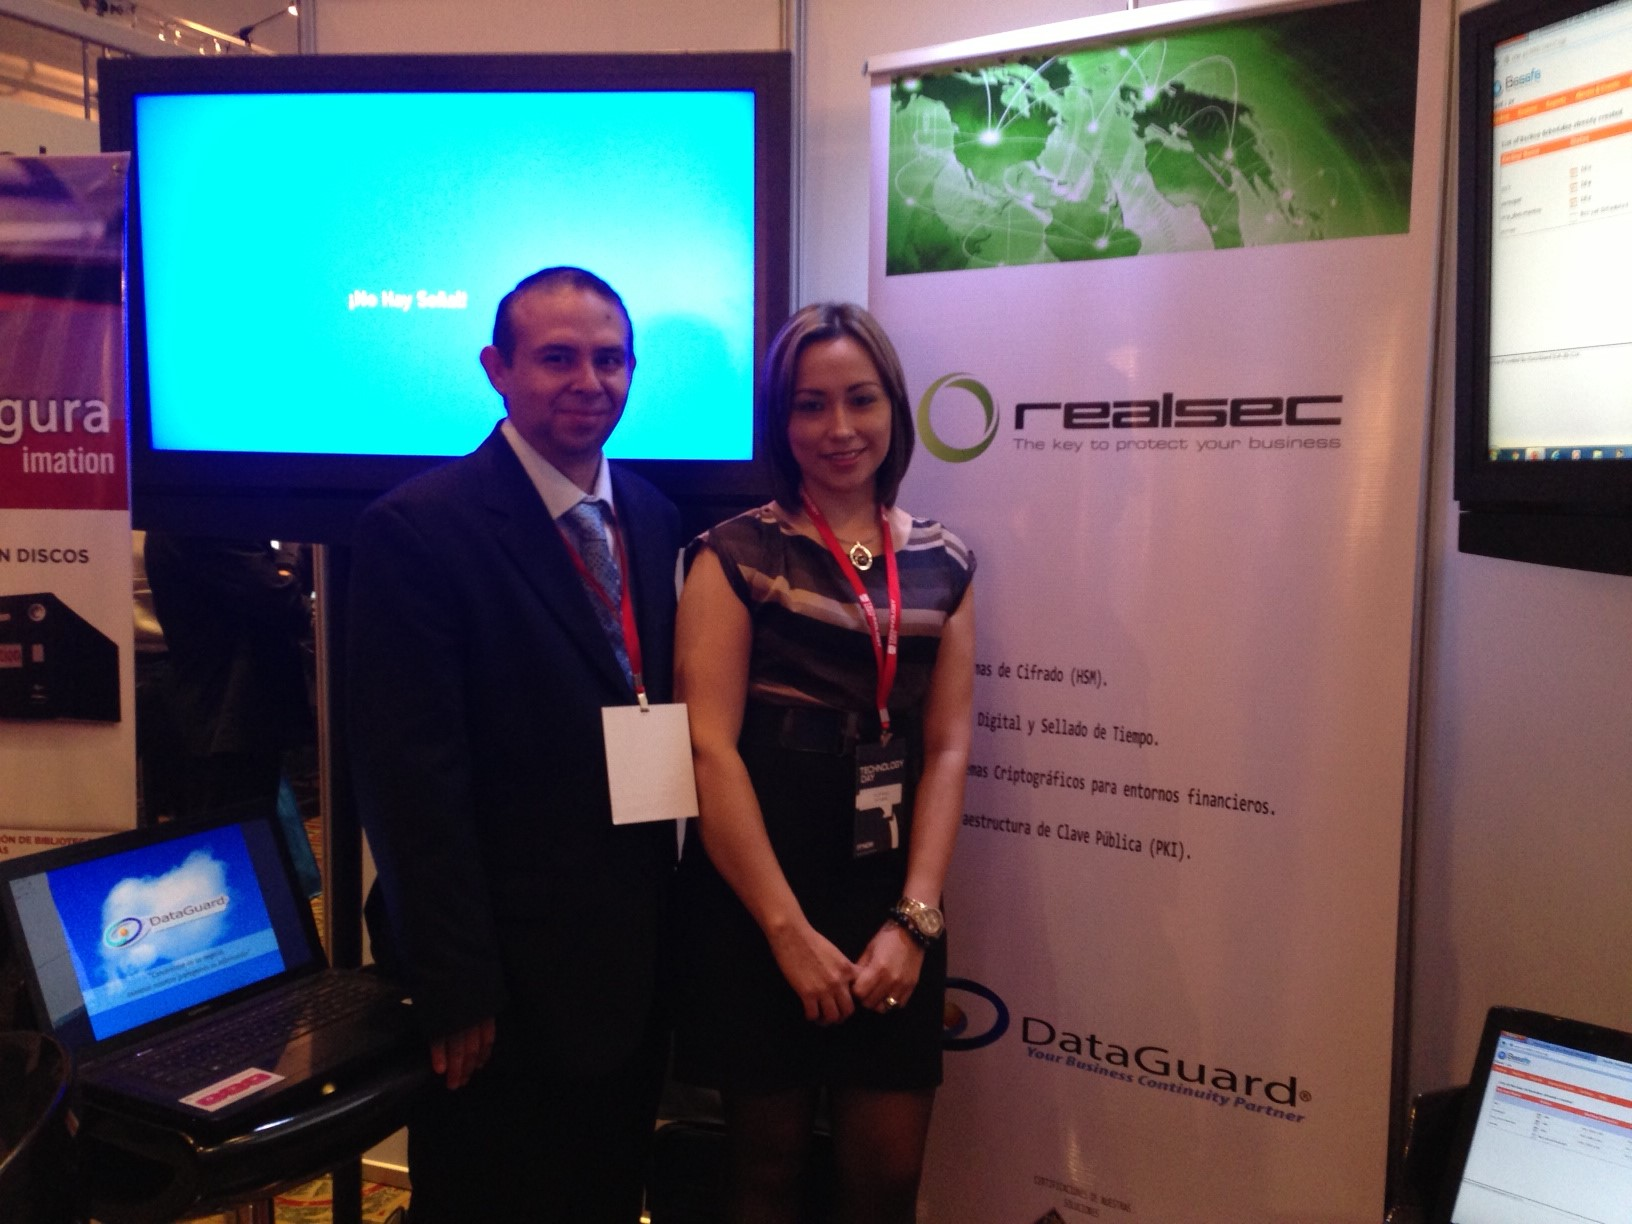 Staff REALSEC Dataguard on stand